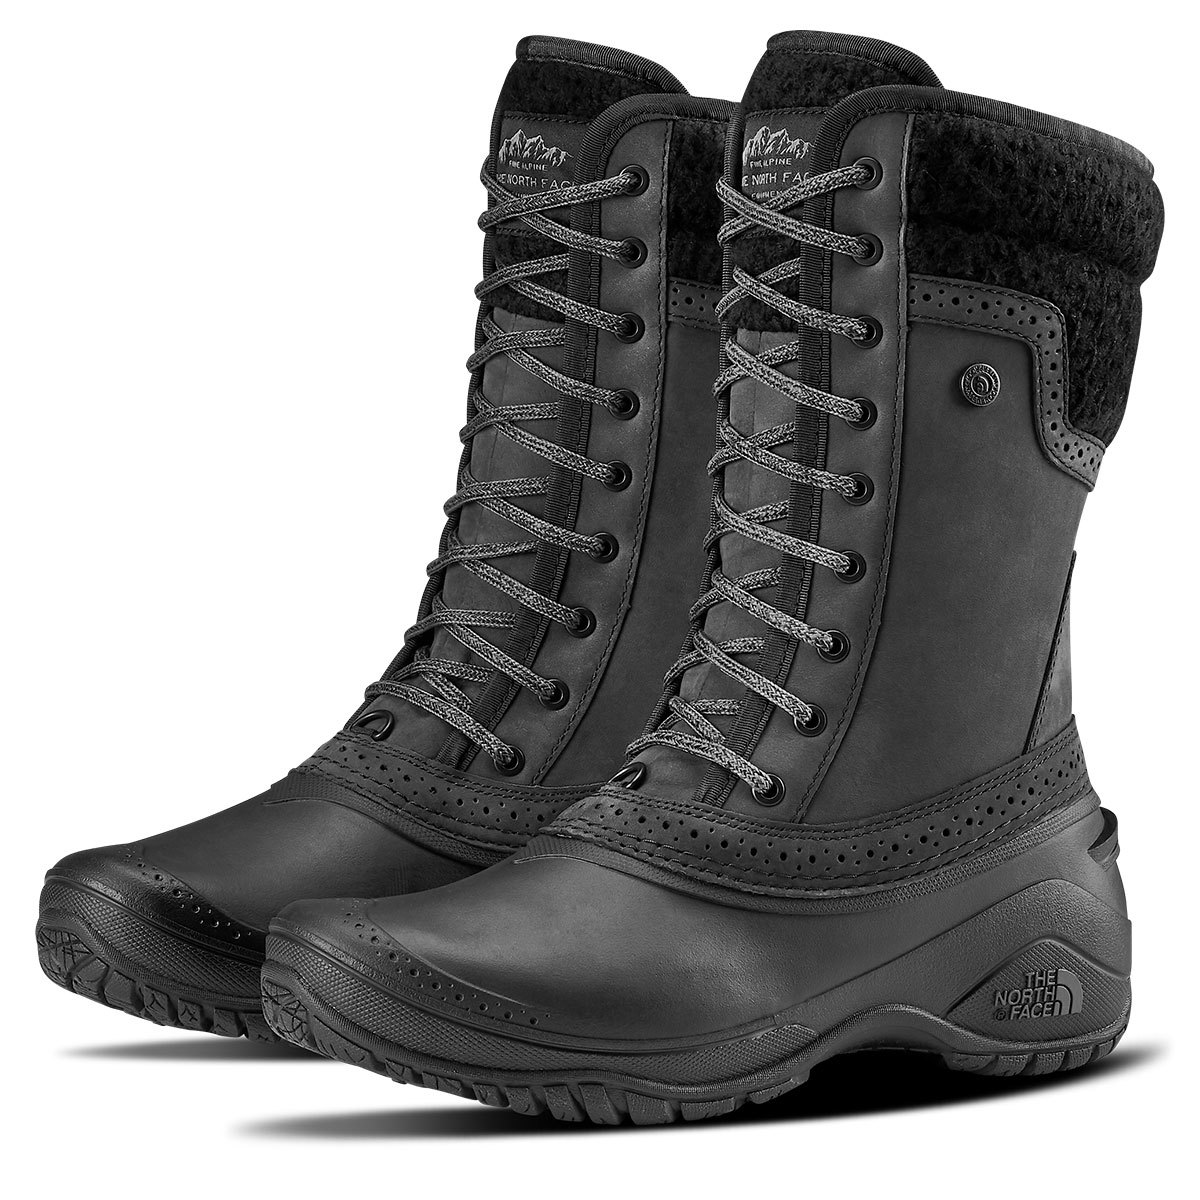 The North Face Women's Shellista Ii Mid Waterproof Boots, Tarmac Green/tapenade Green